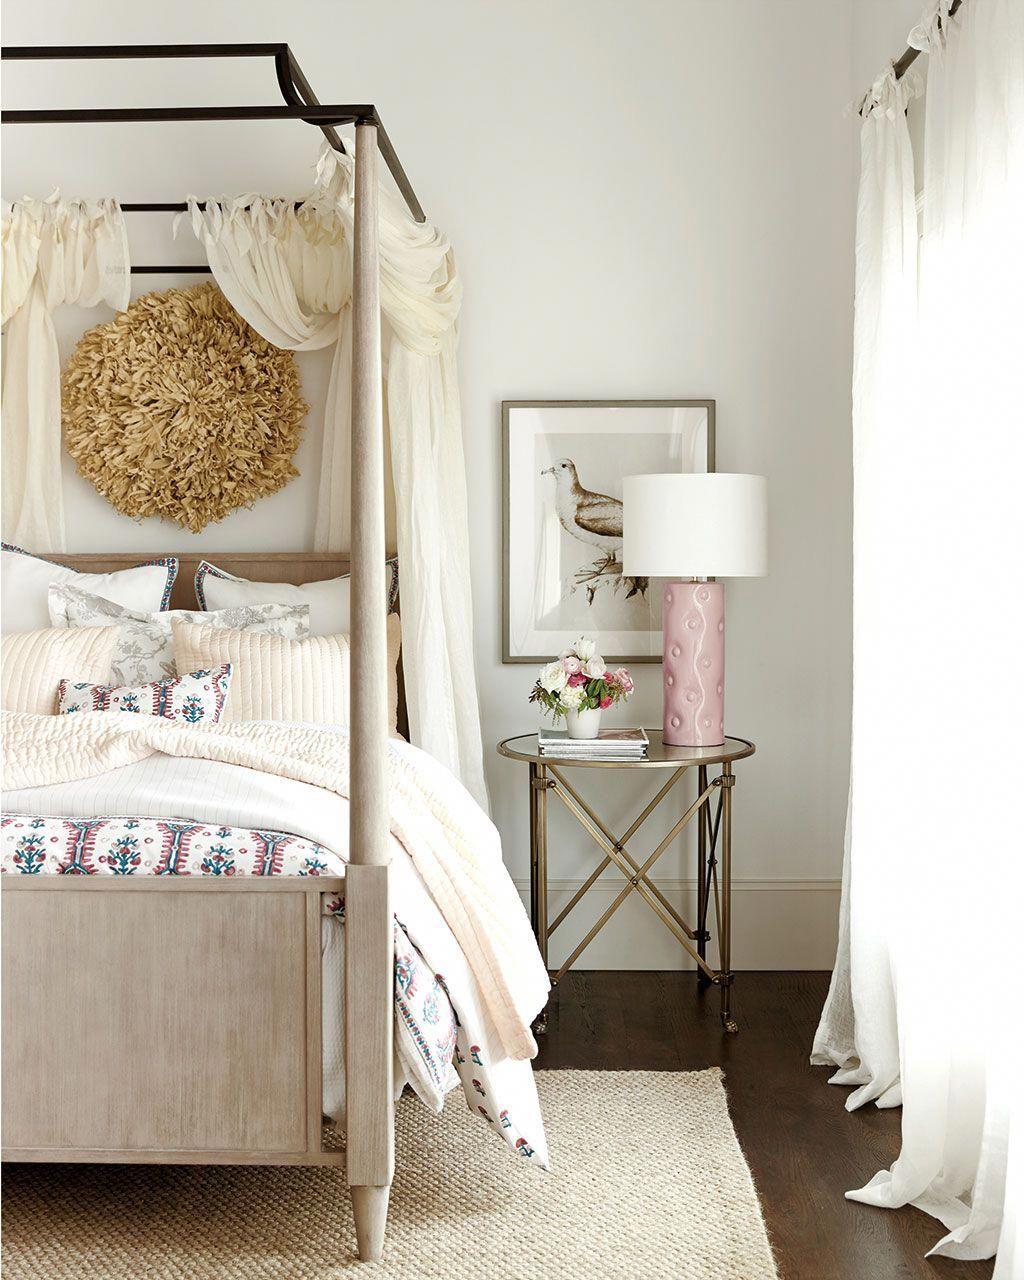 Discover more about bedroom furniture arrangement